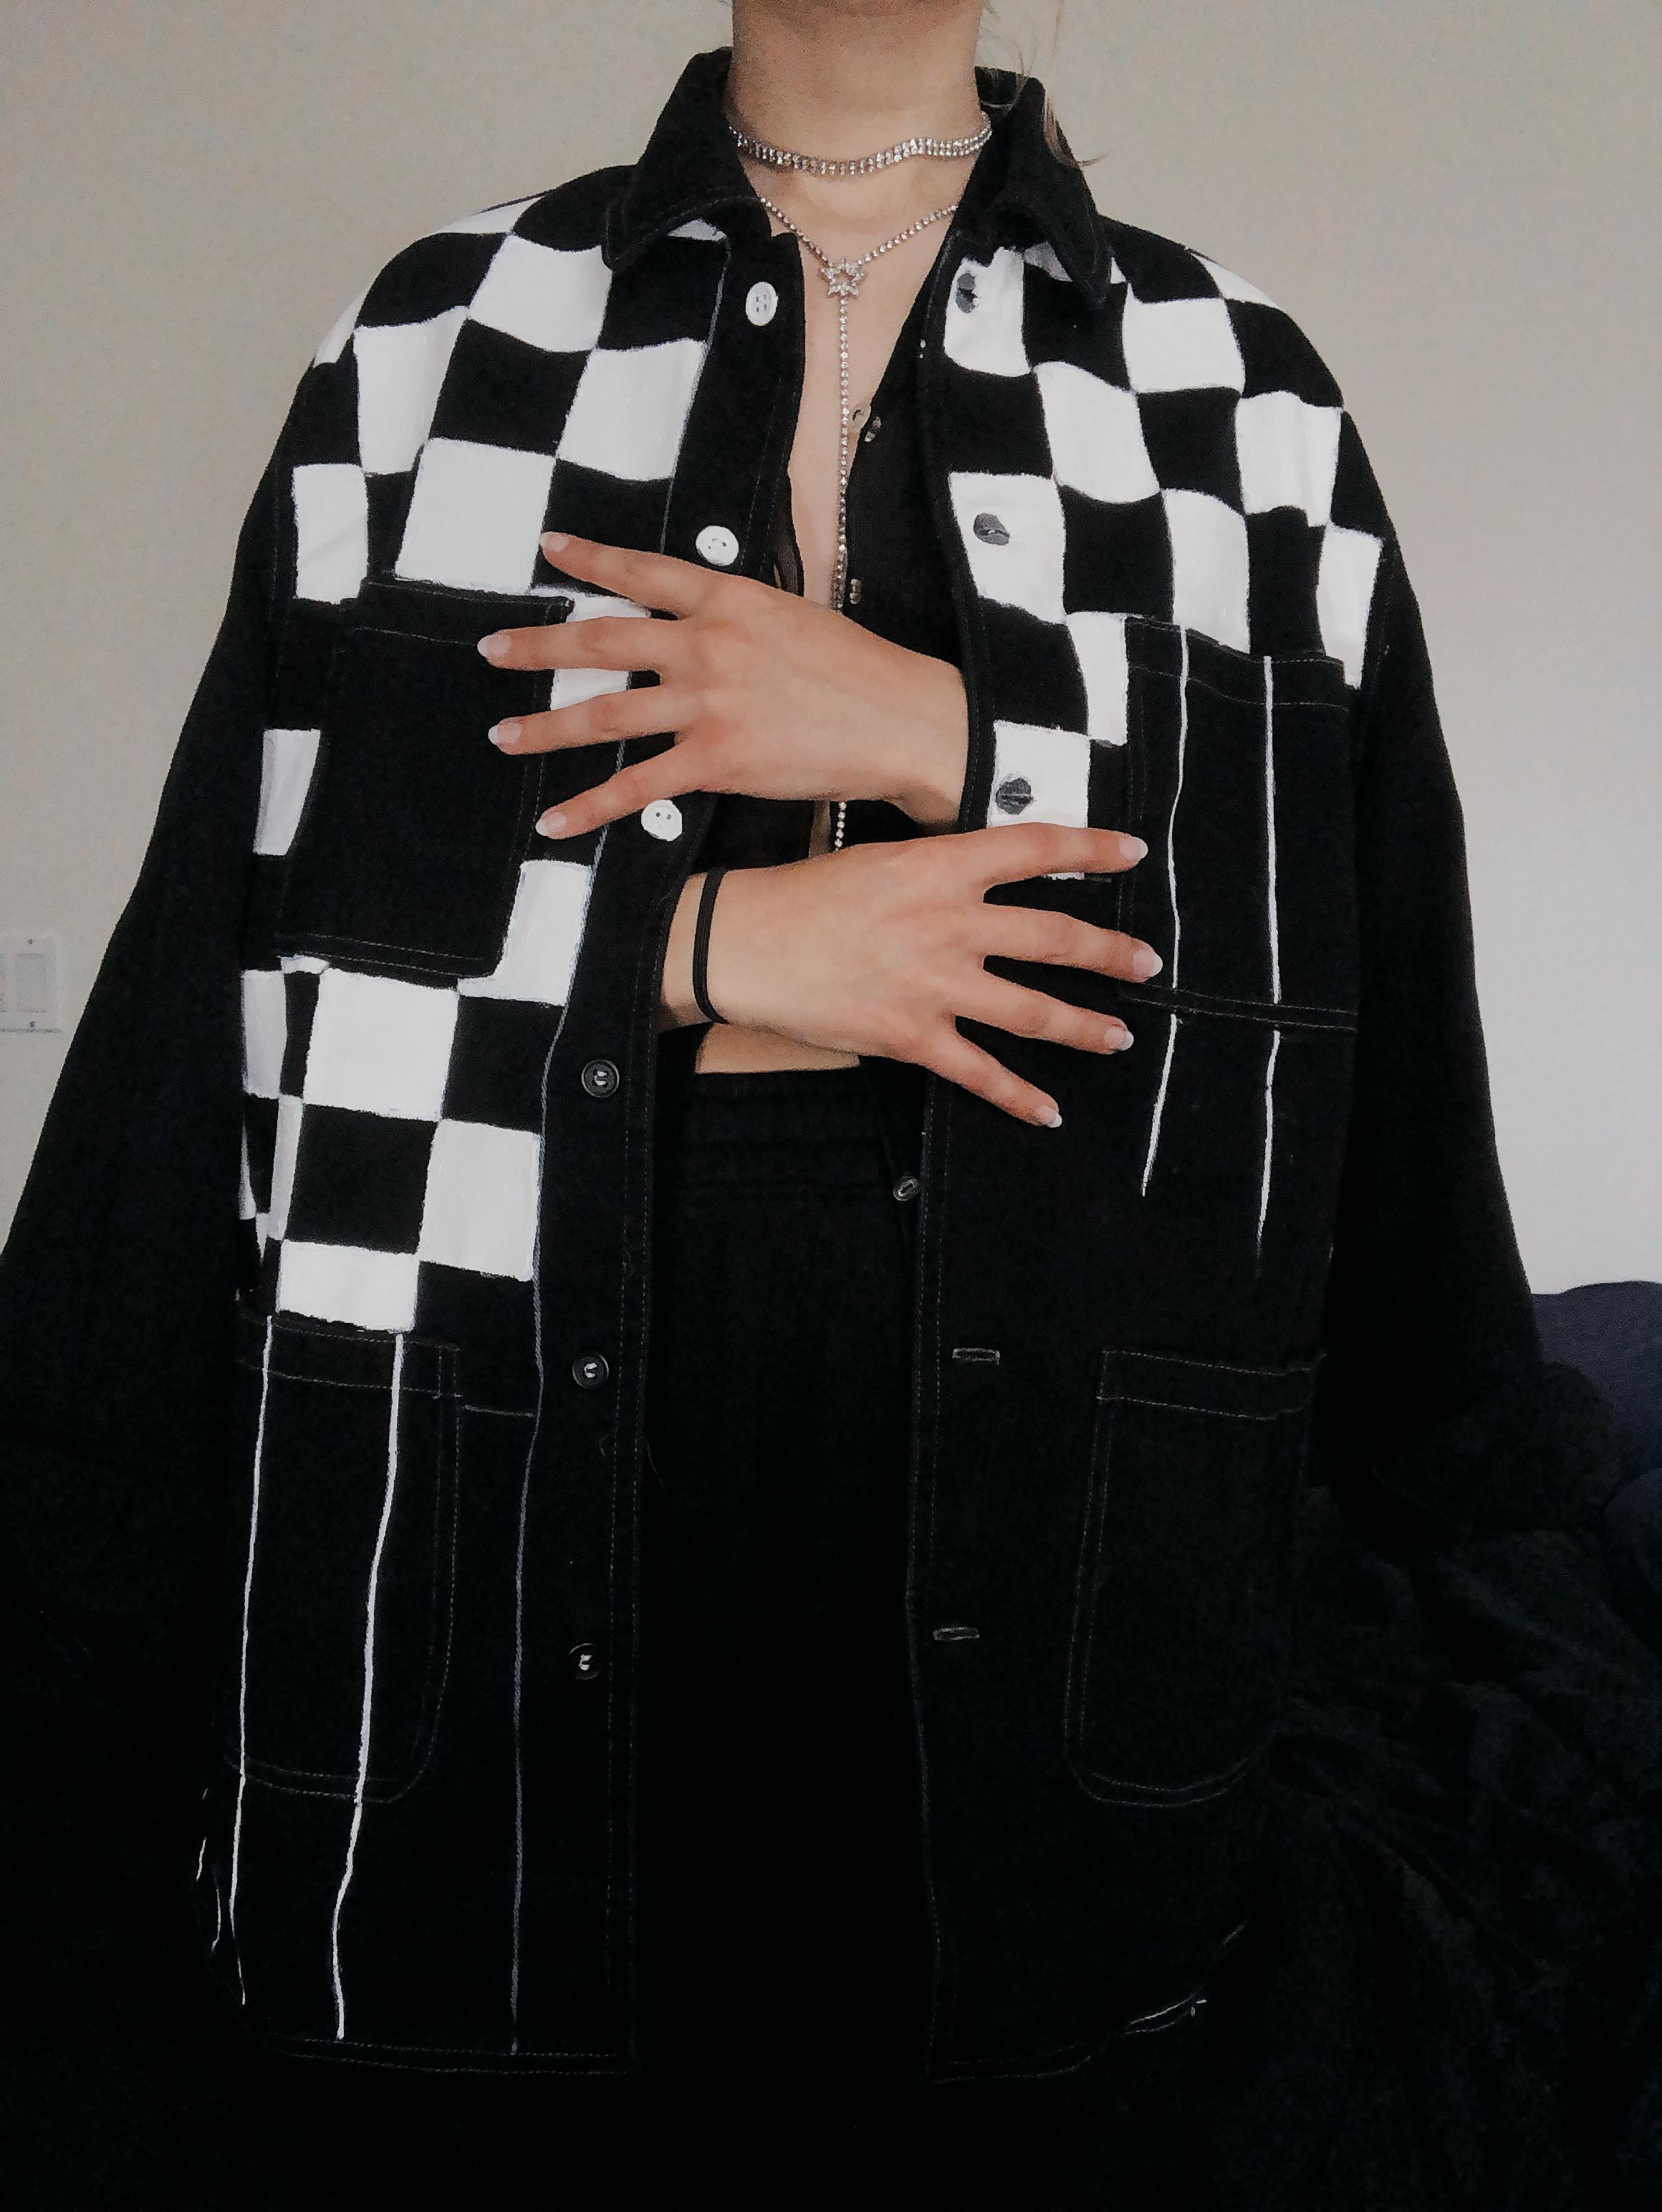 Checkered Jacket Checkered Jacket Painted Denim Jacket Ashley Clothes [ 3088 x 2320 Pixel ]